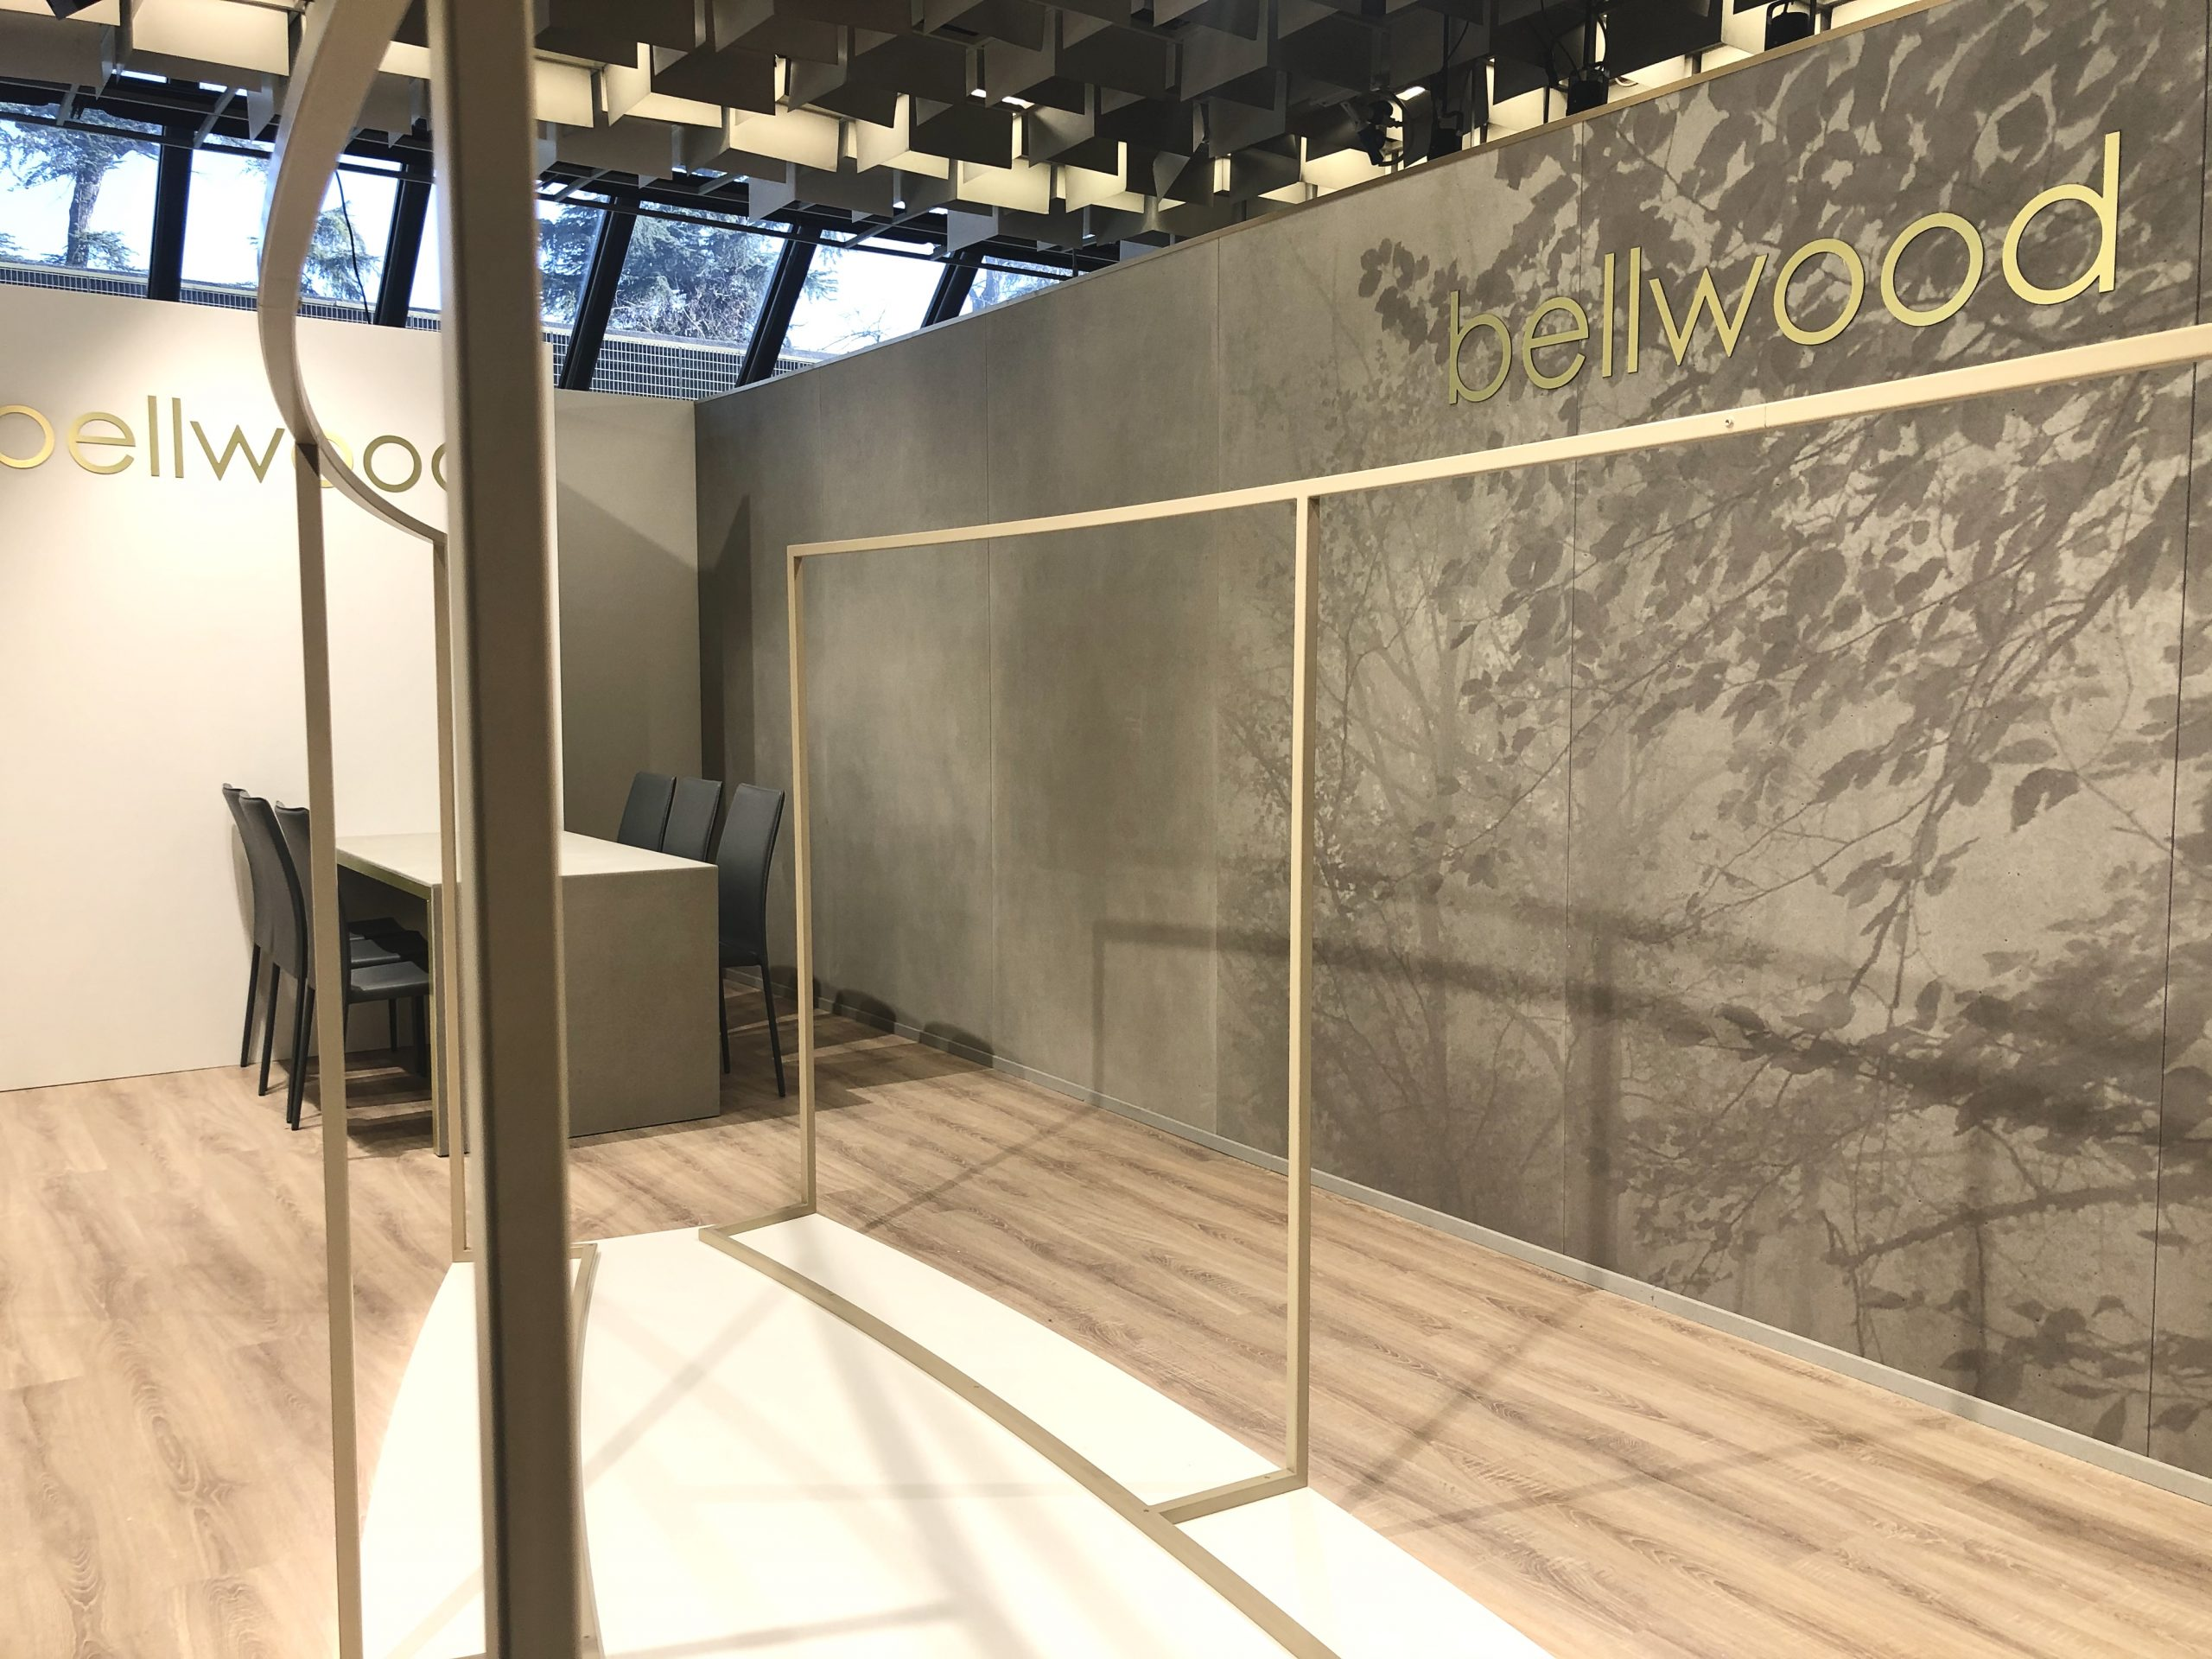 Stand c/o Pitti Immagine Uomo BELLWOOD, Conclad Decor by Arch. Silvia Fregoli DesMos3